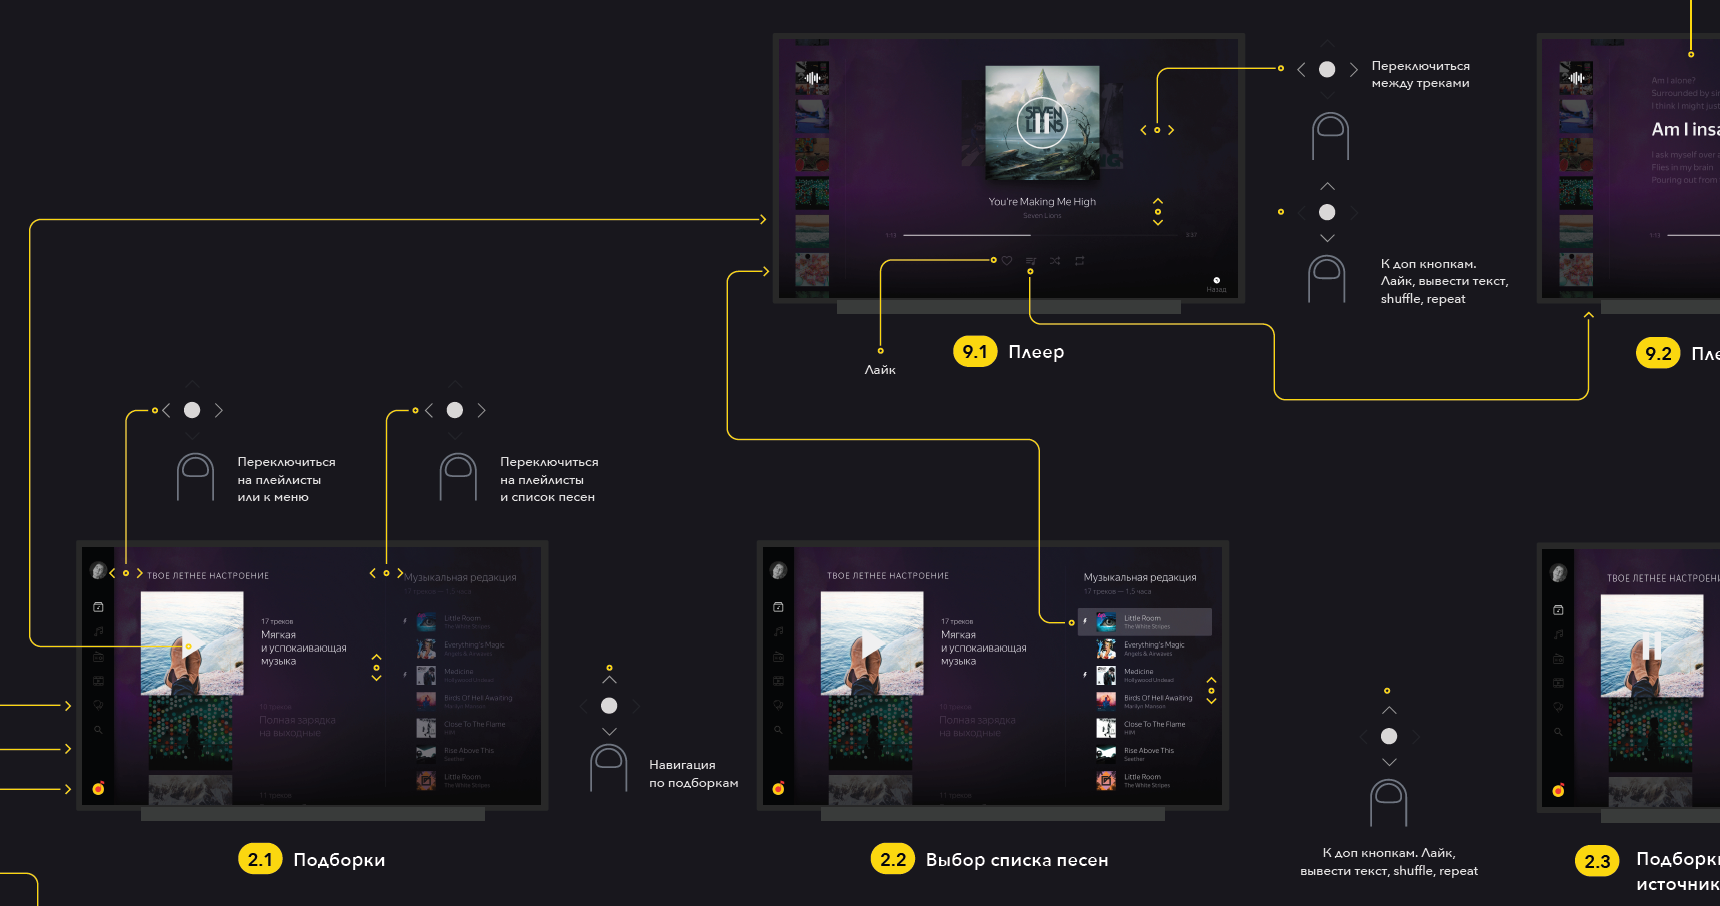 Школа разработчиков интерфейсов Яндекса снова открывает набор